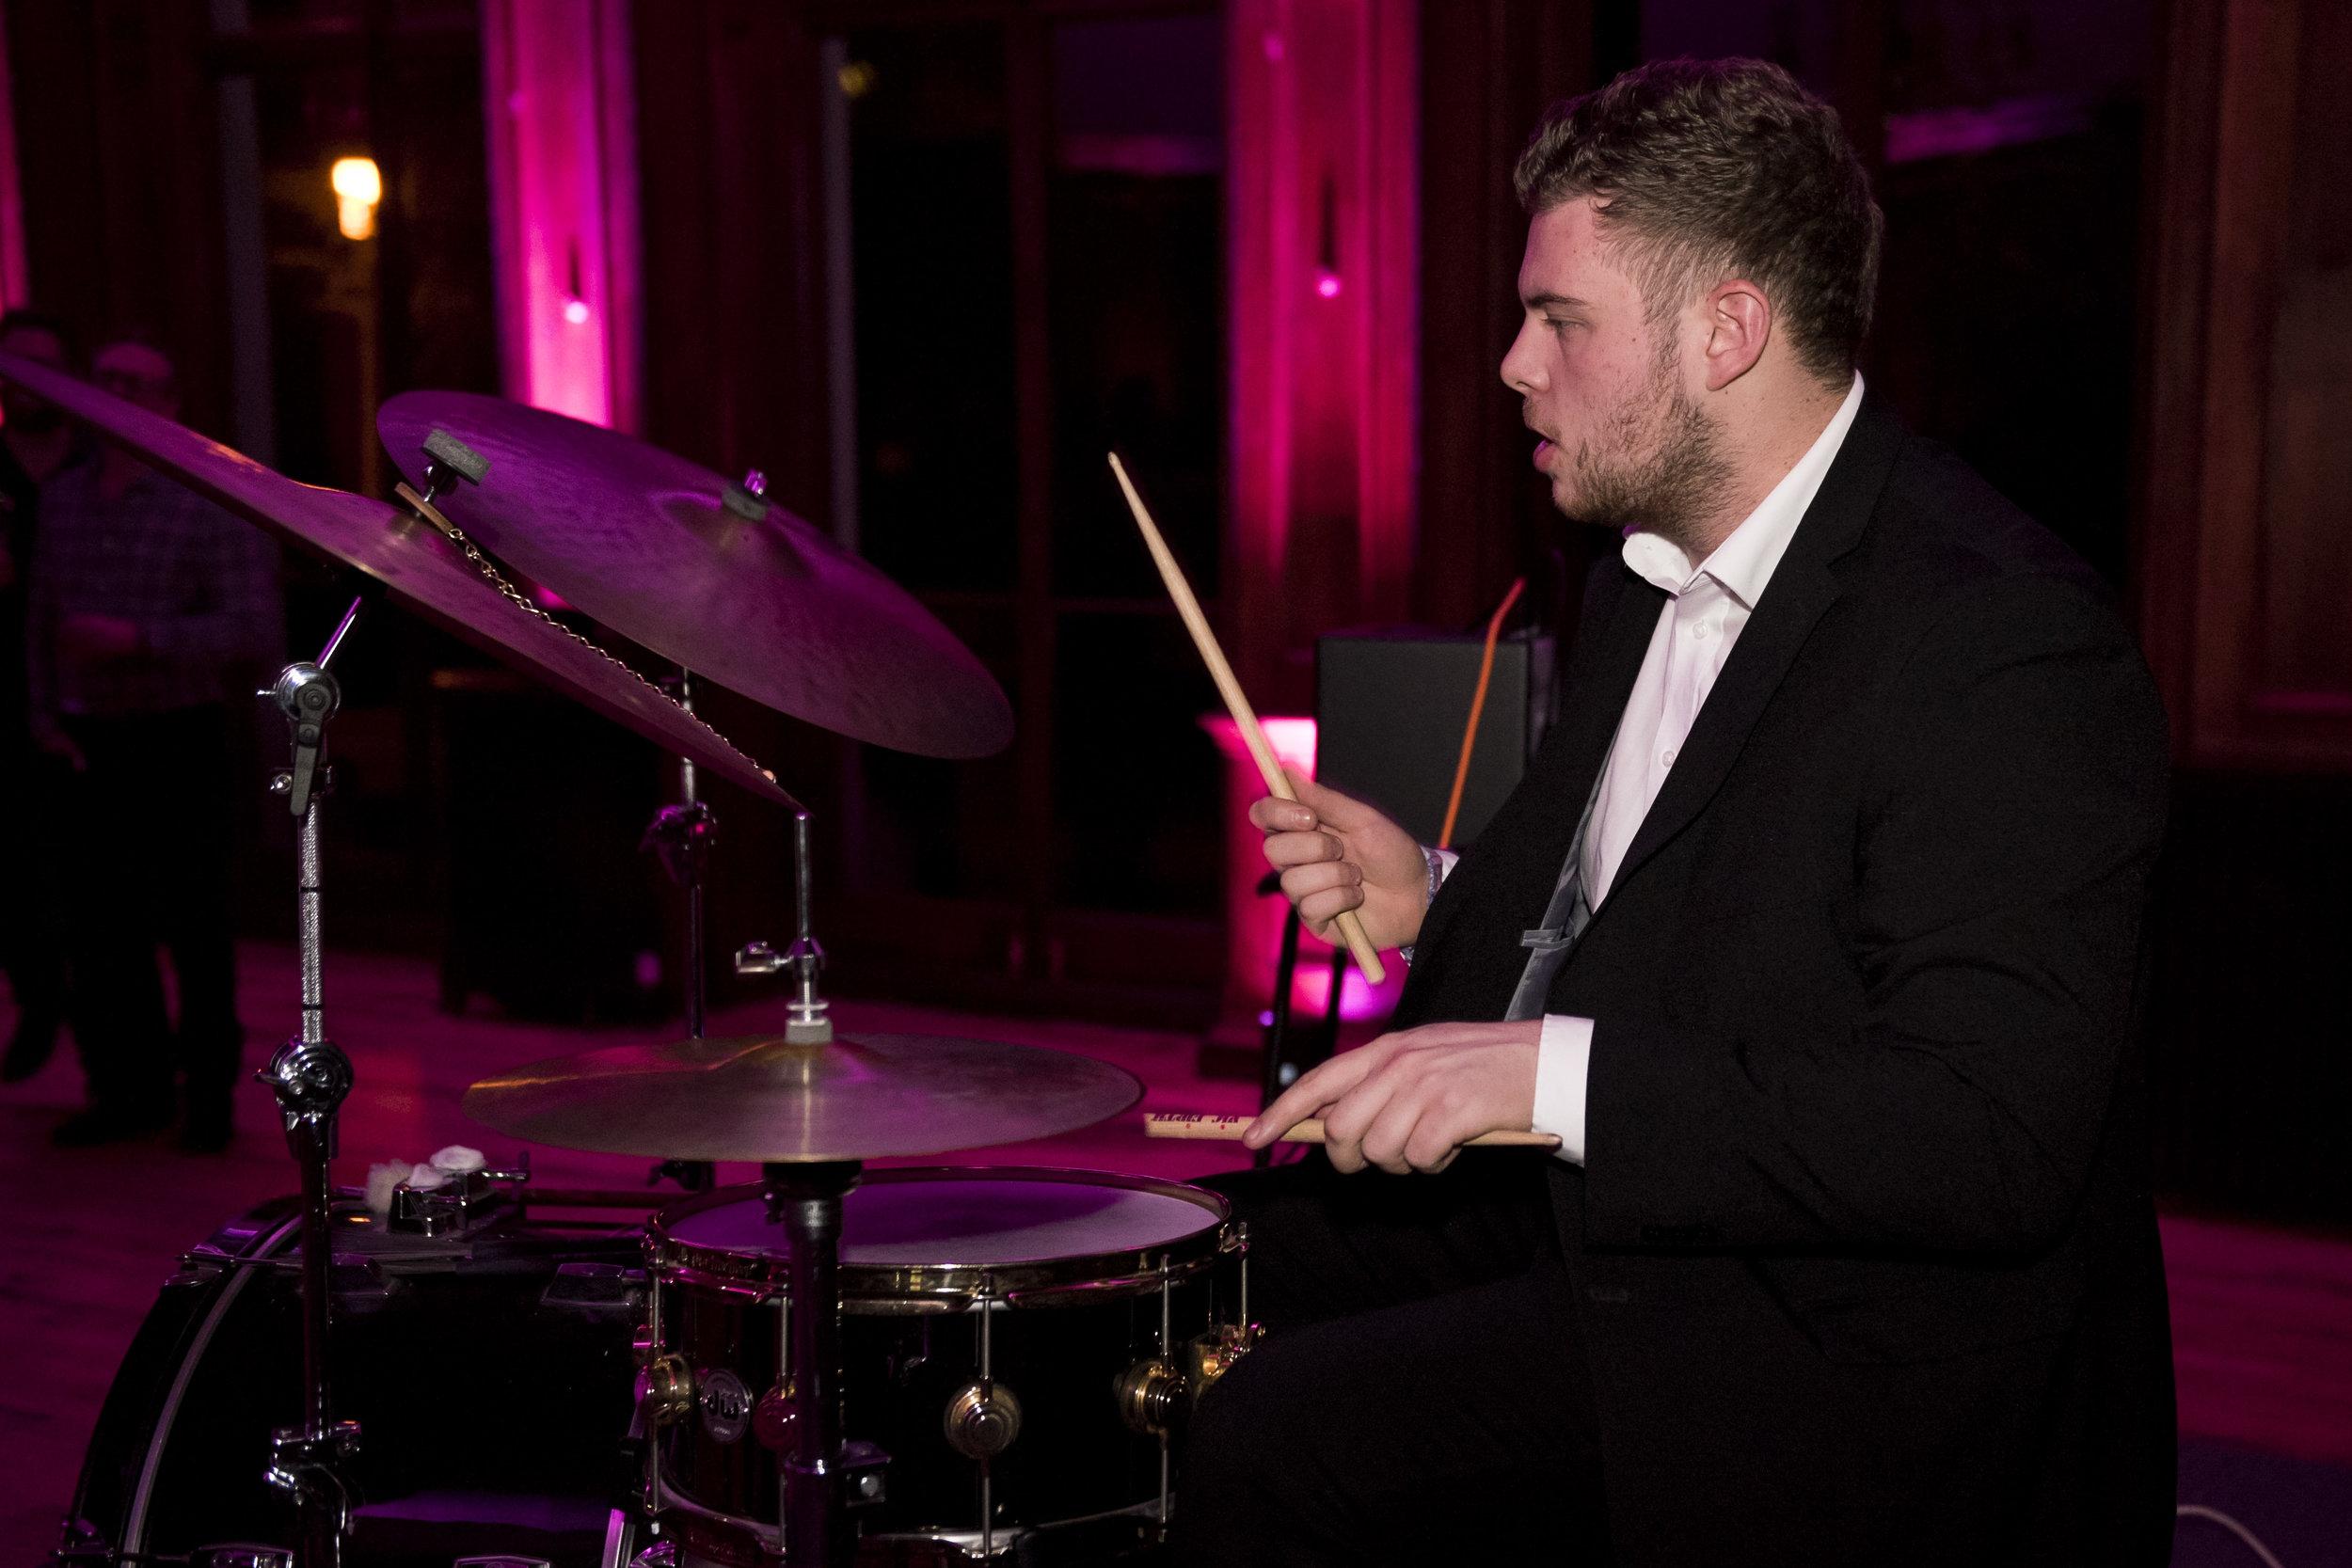 drummer in band roehampton university.jpg